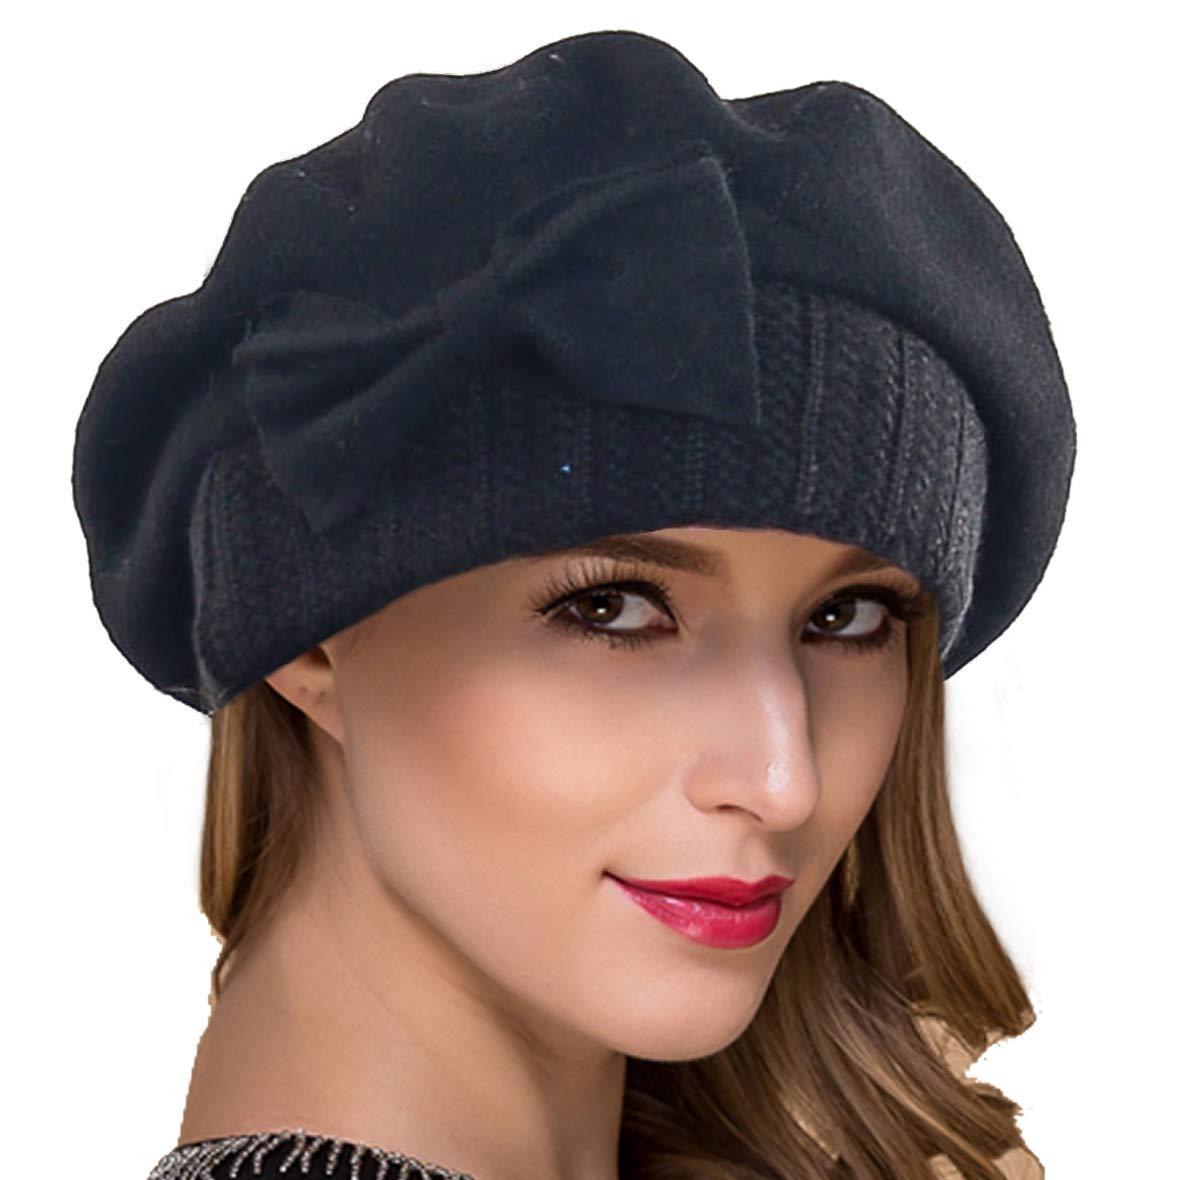 Ruphedy Women French Beret Knit Wool Beret Beanie Winter Dress Hats Hy022 (Black) by Ruphedy